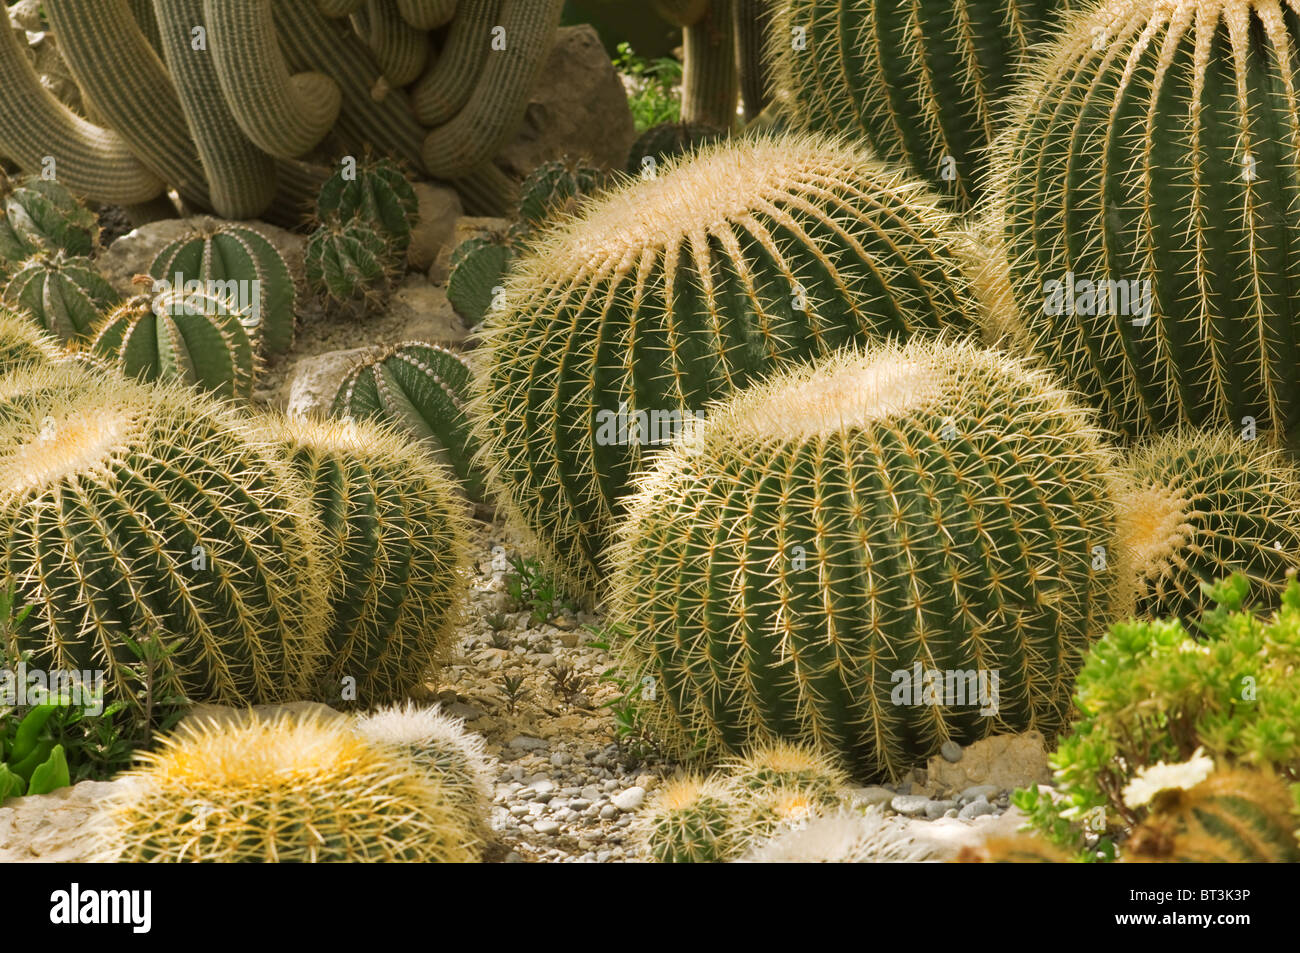 different cactus stock photos different cactus stock images alamy